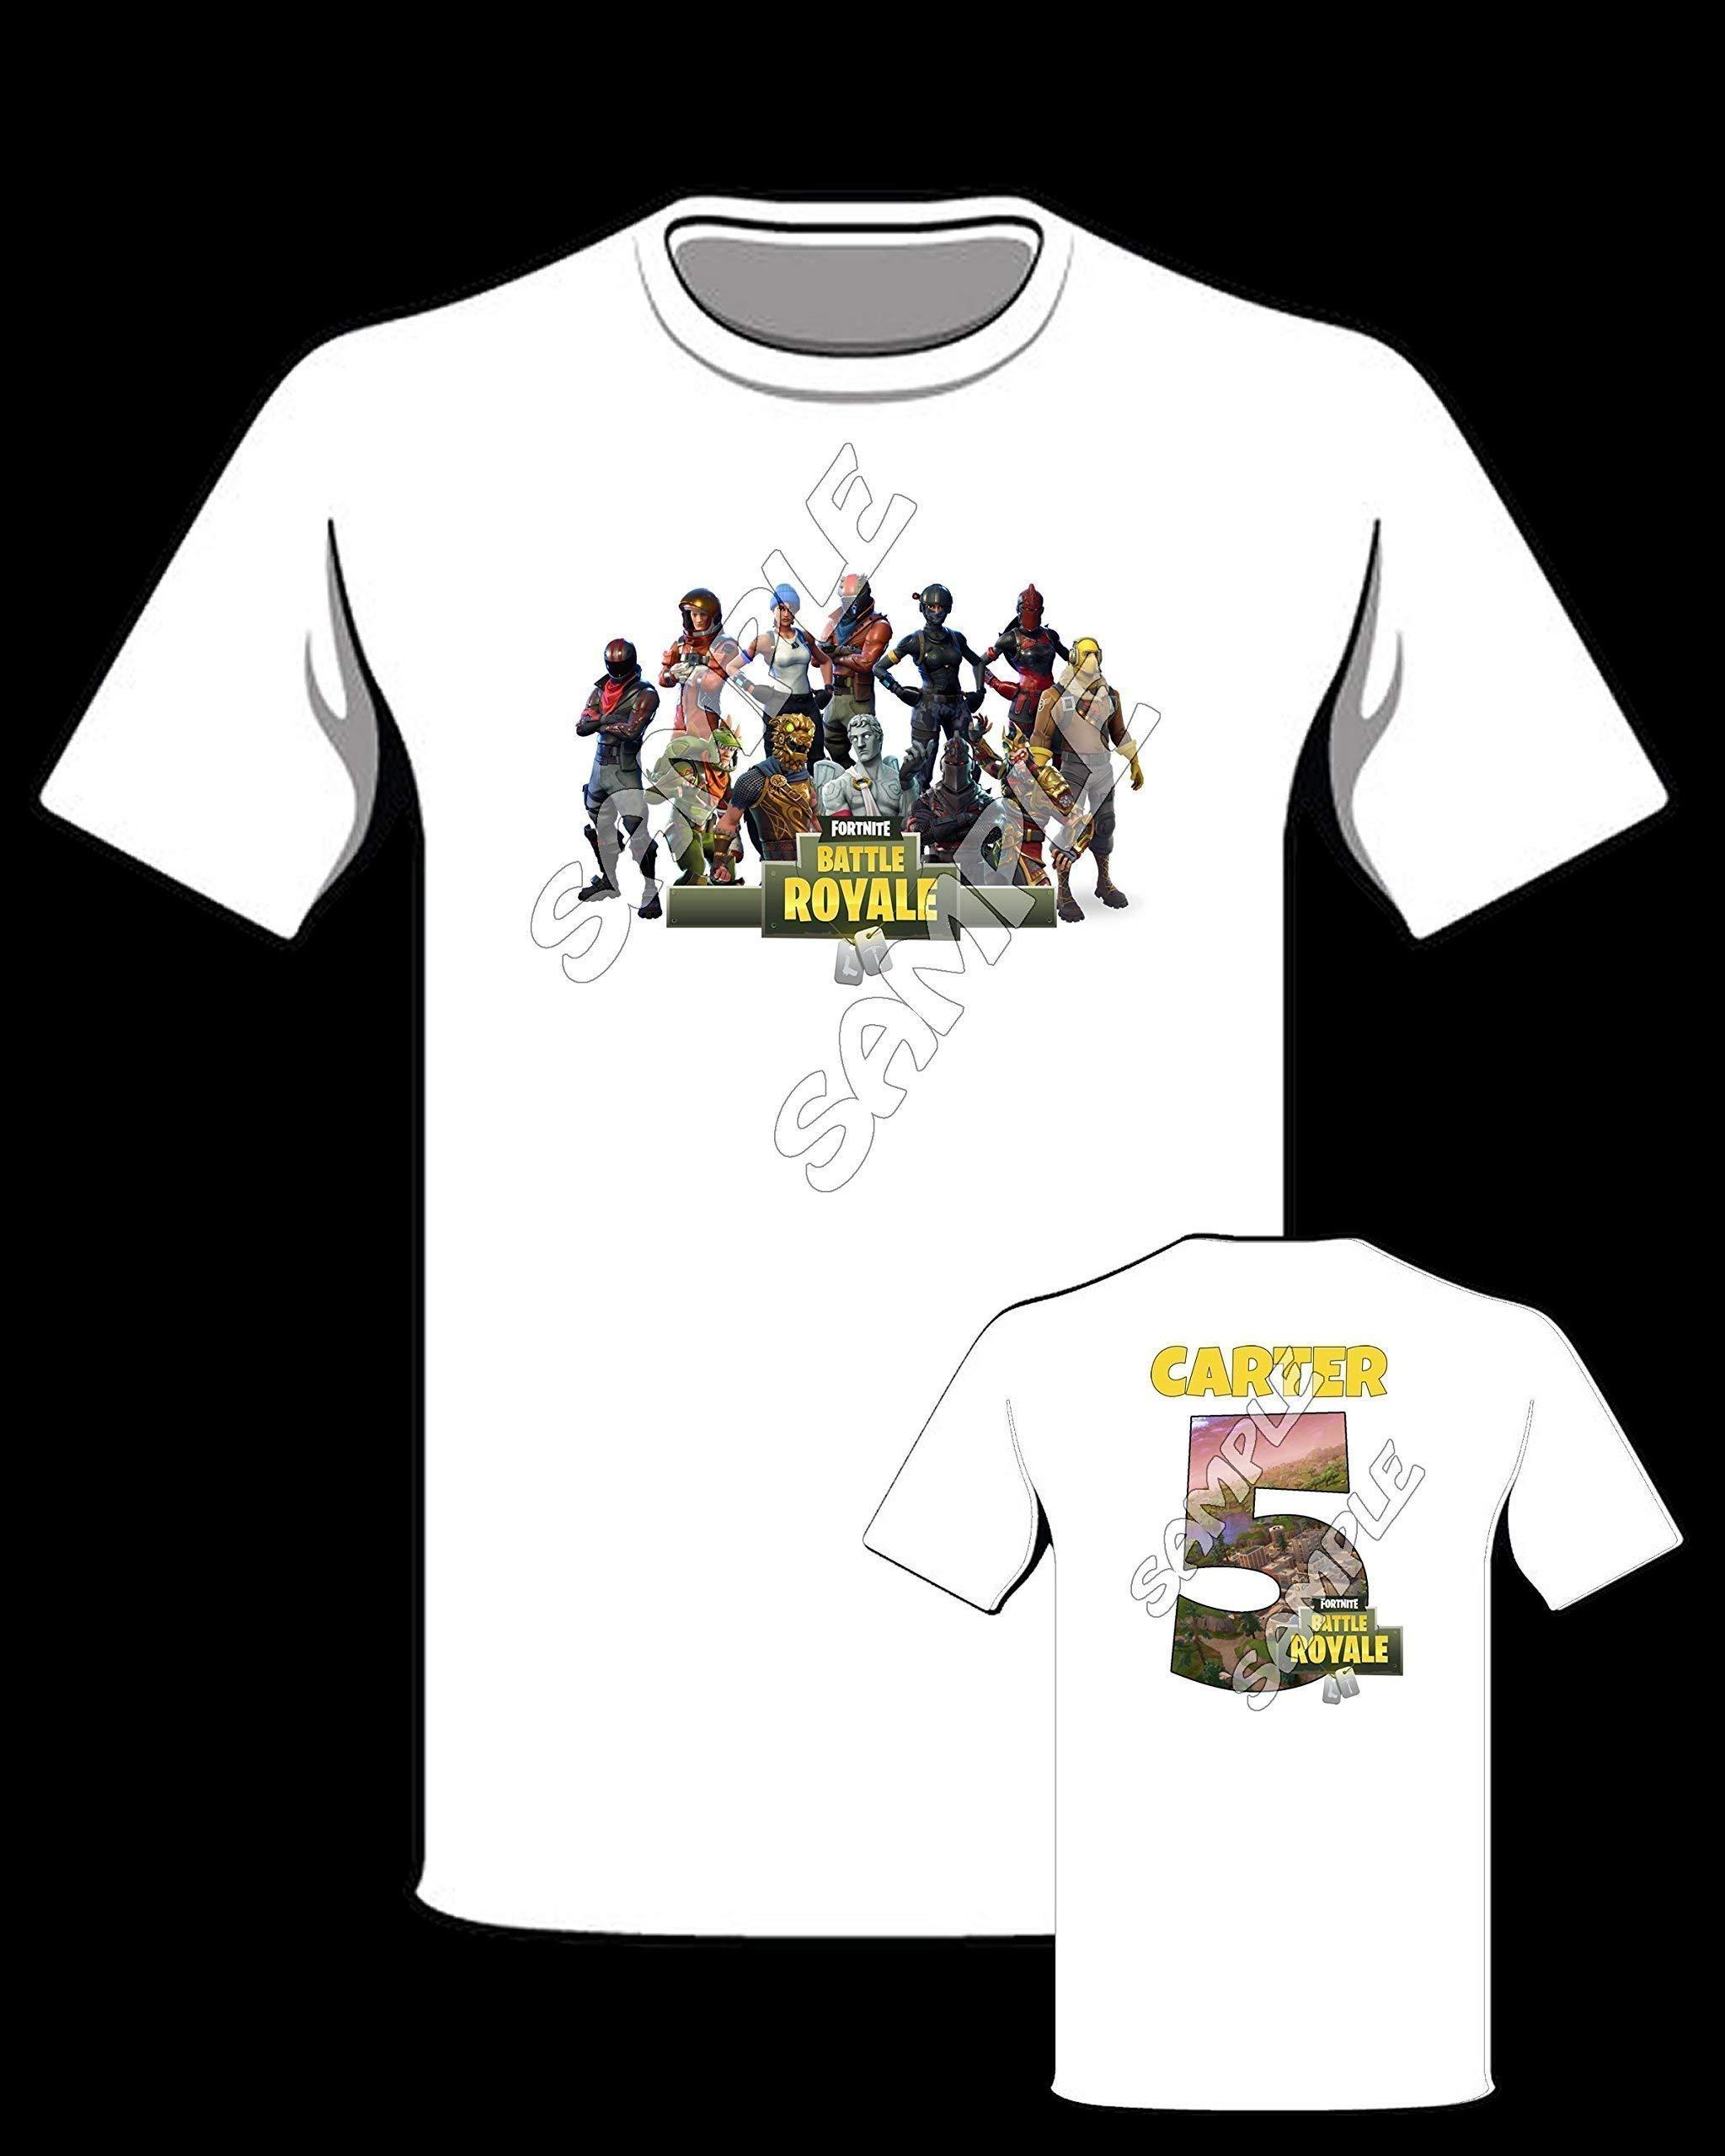 Fortnite themed Personalized Shirt, Fortnite birthday shirt #2